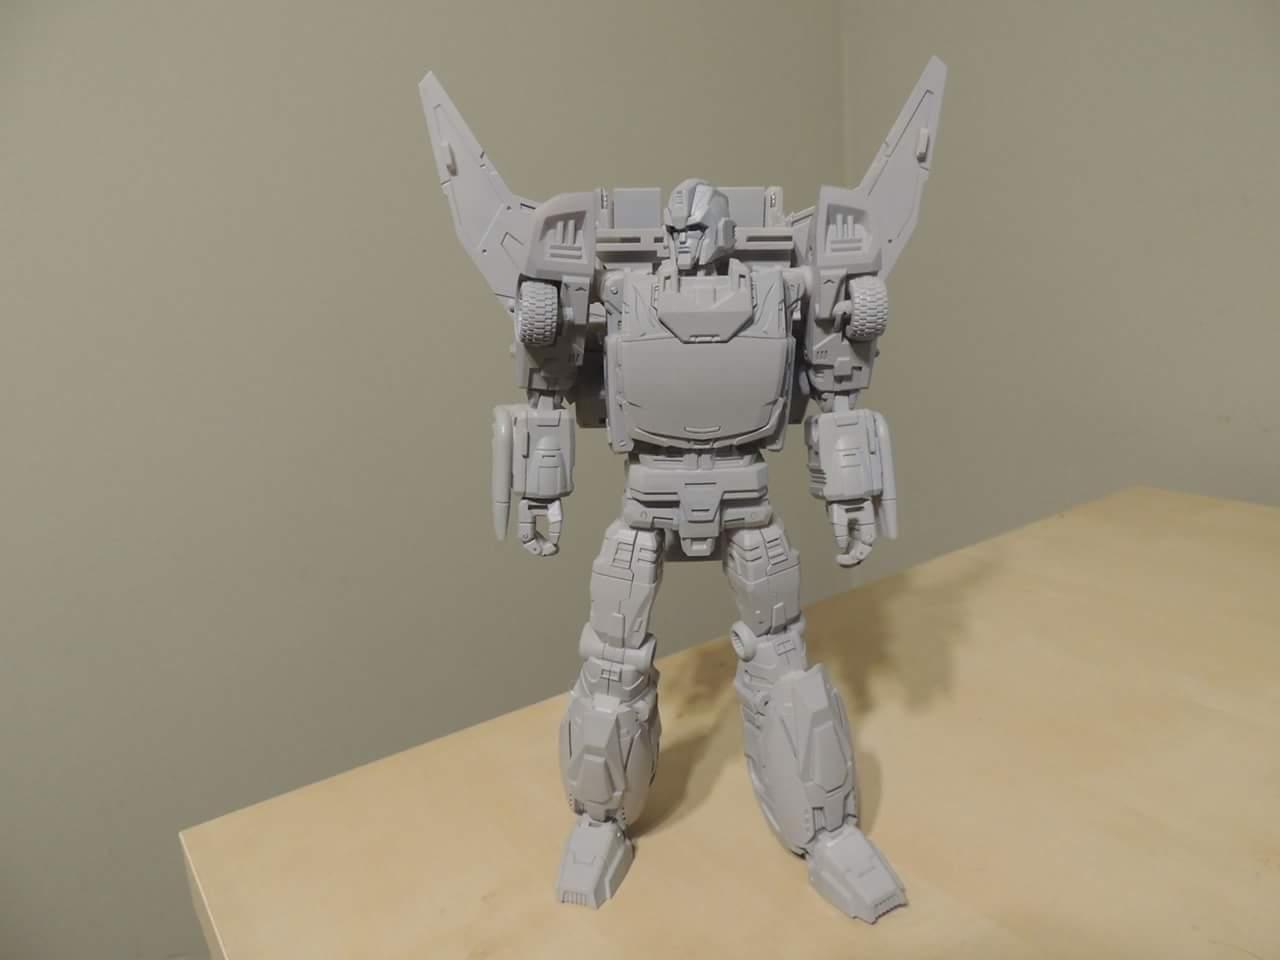 [DX9 Toys] Produit Tiers - Jouet D-06 Carry aka Rodimus et D-06T Terror aka Black Rodimus T9JyuOZ6